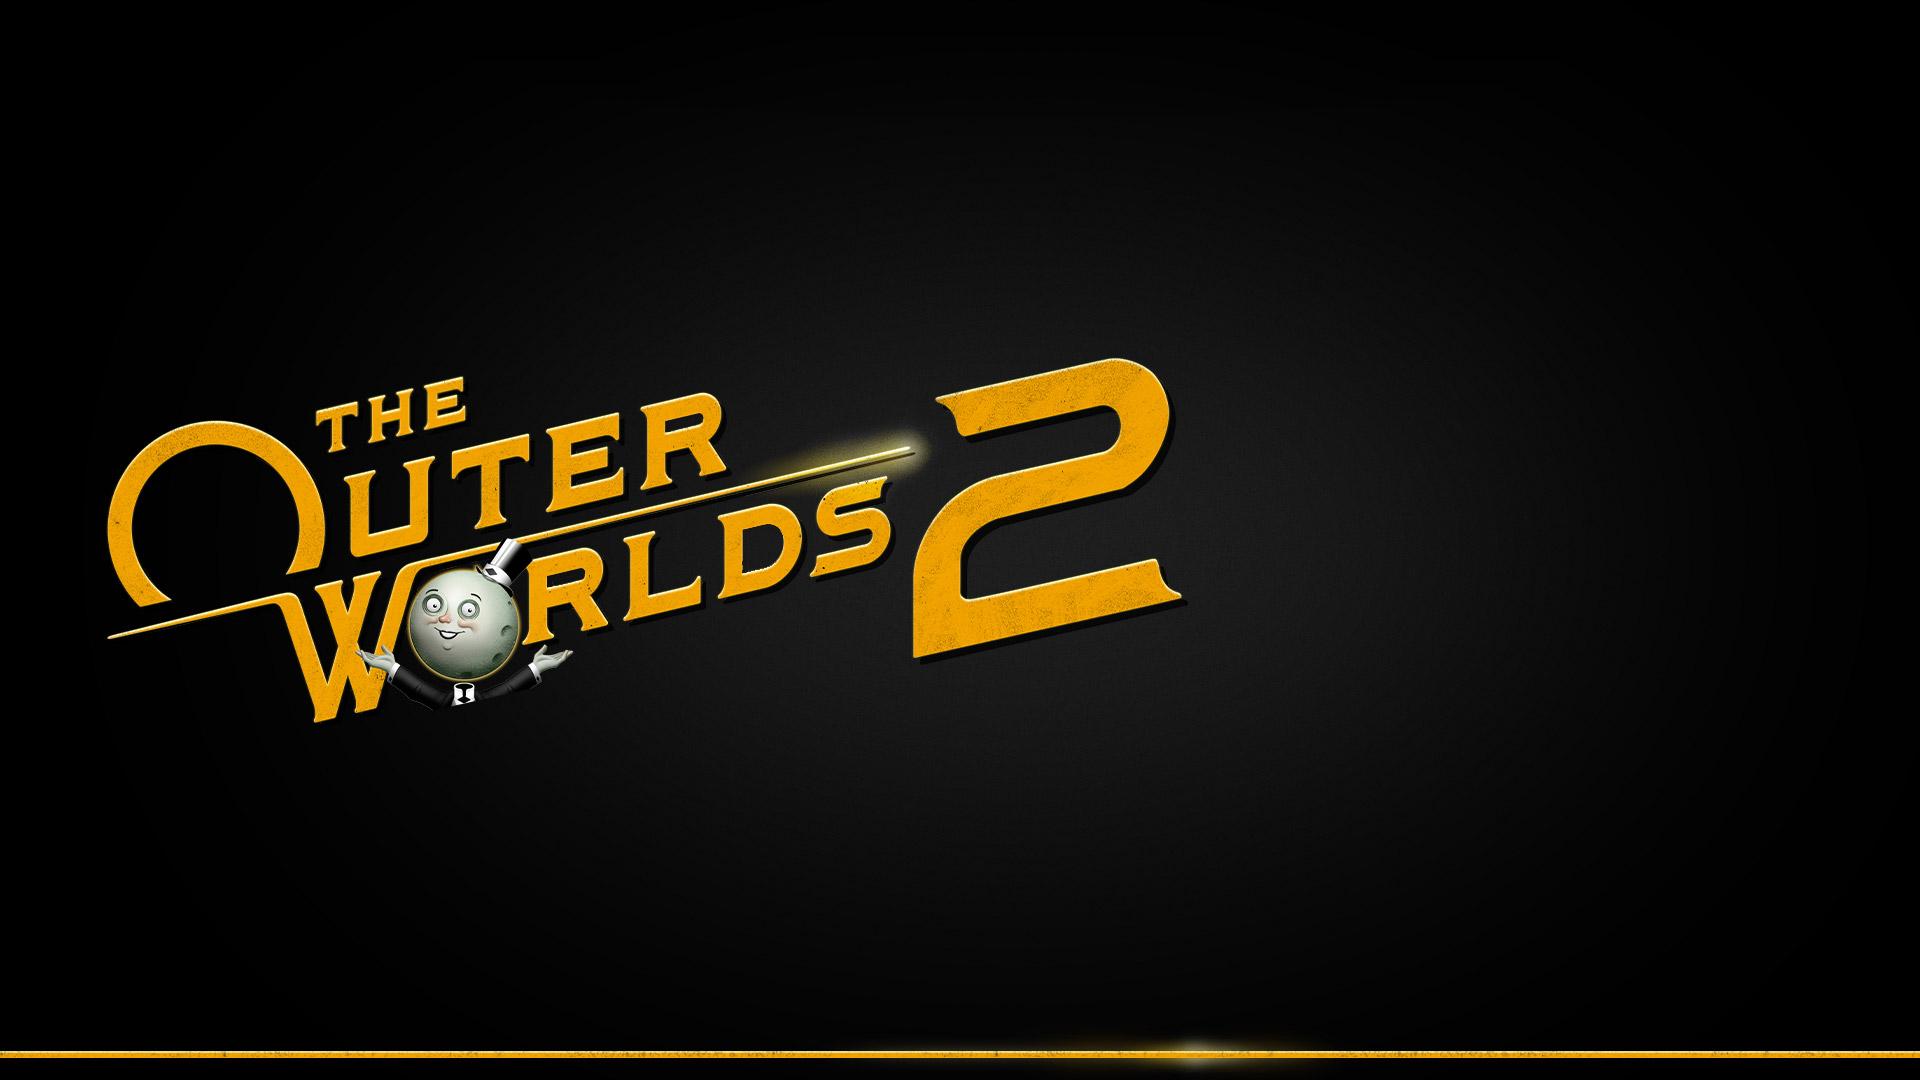 Logotipo de The Outer Worlds 2